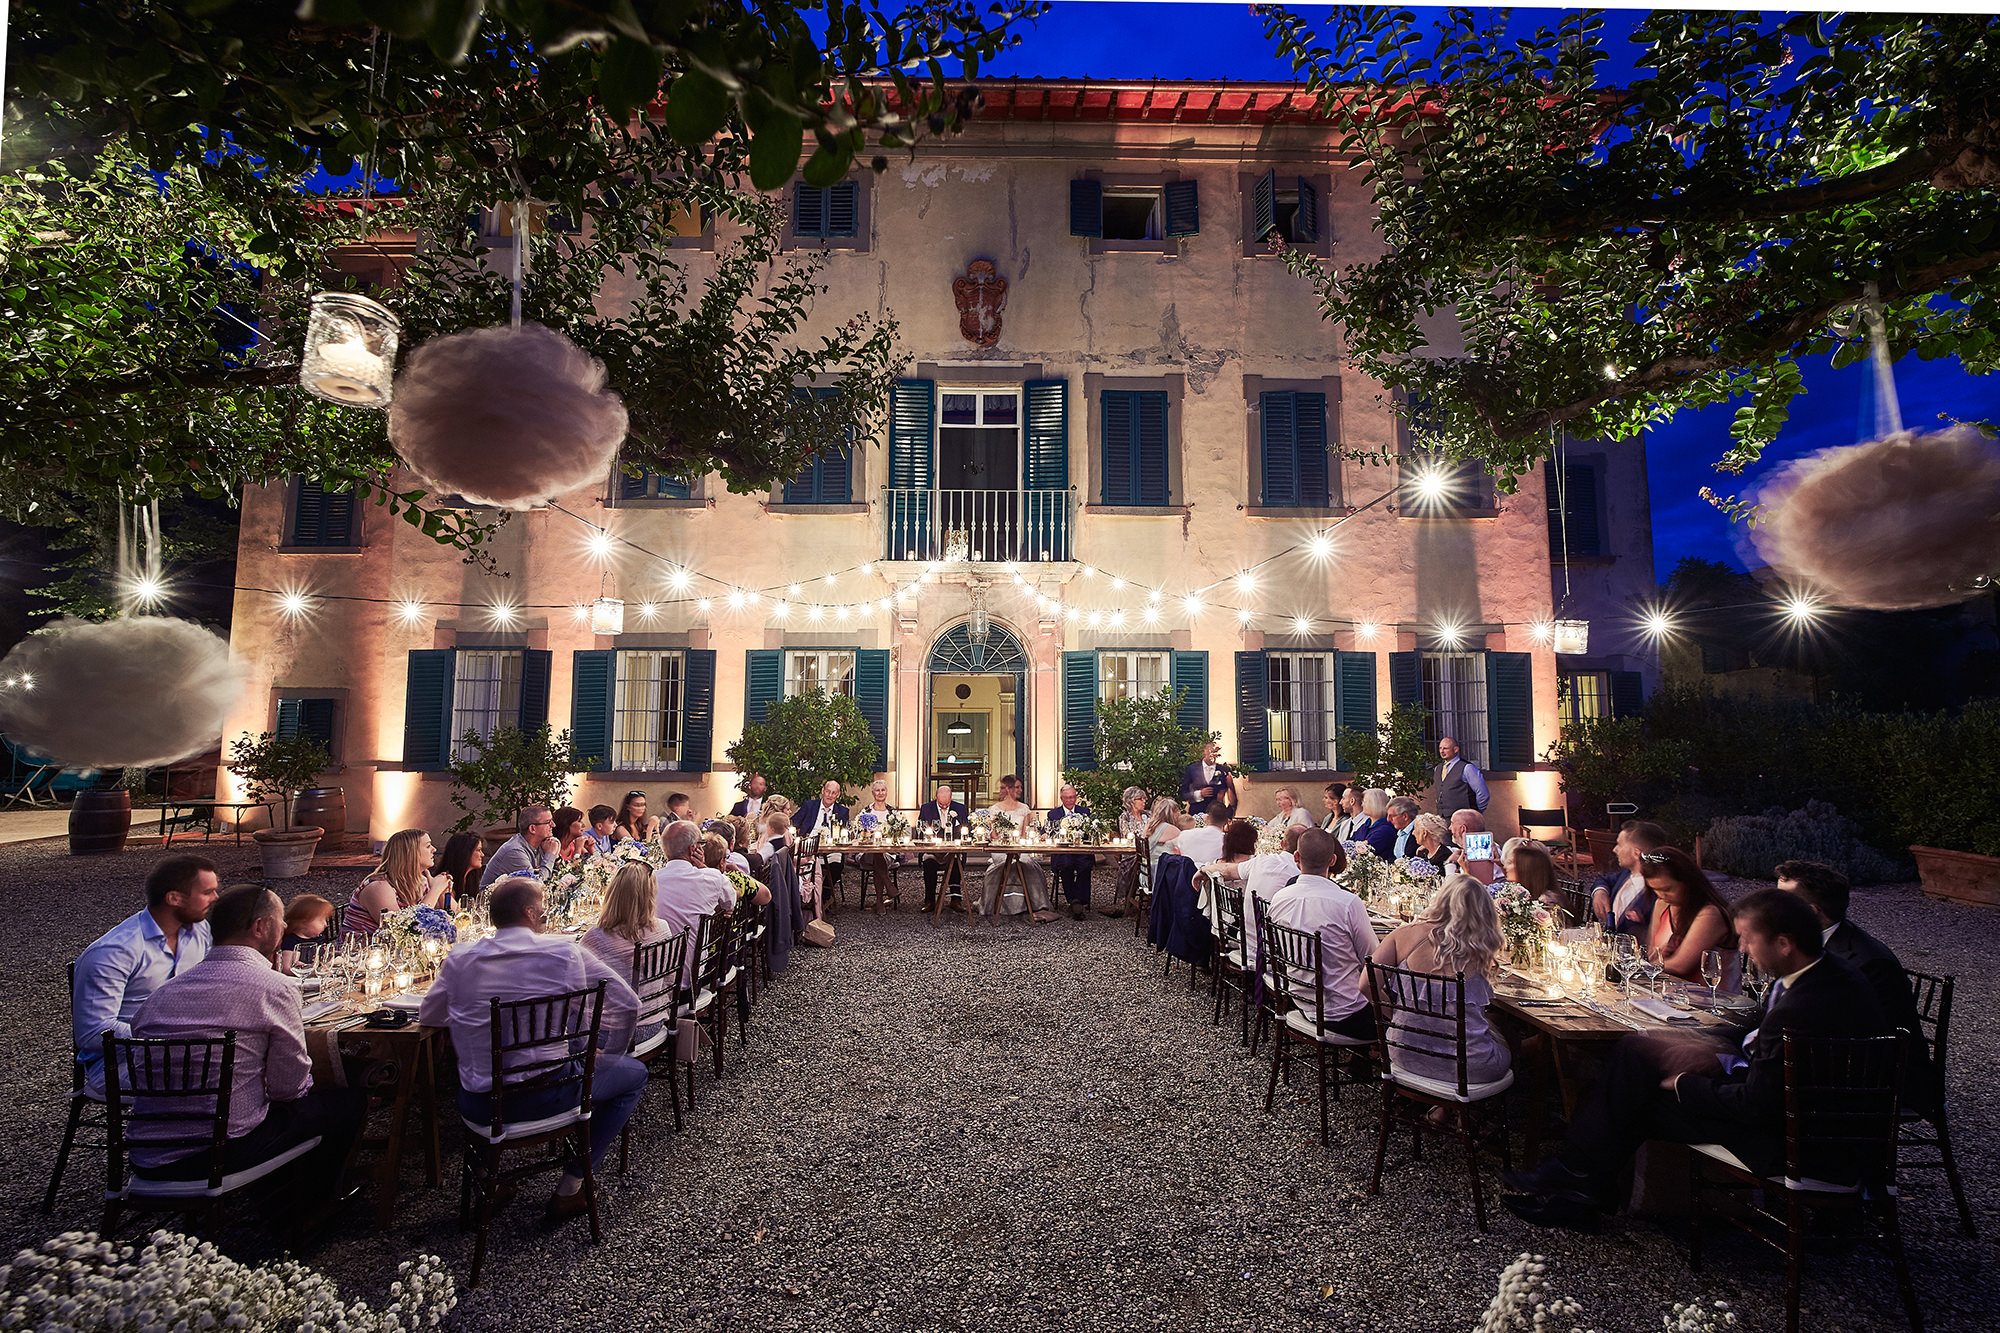 Wedding dinner in Tuscan villa illuminated with string lights